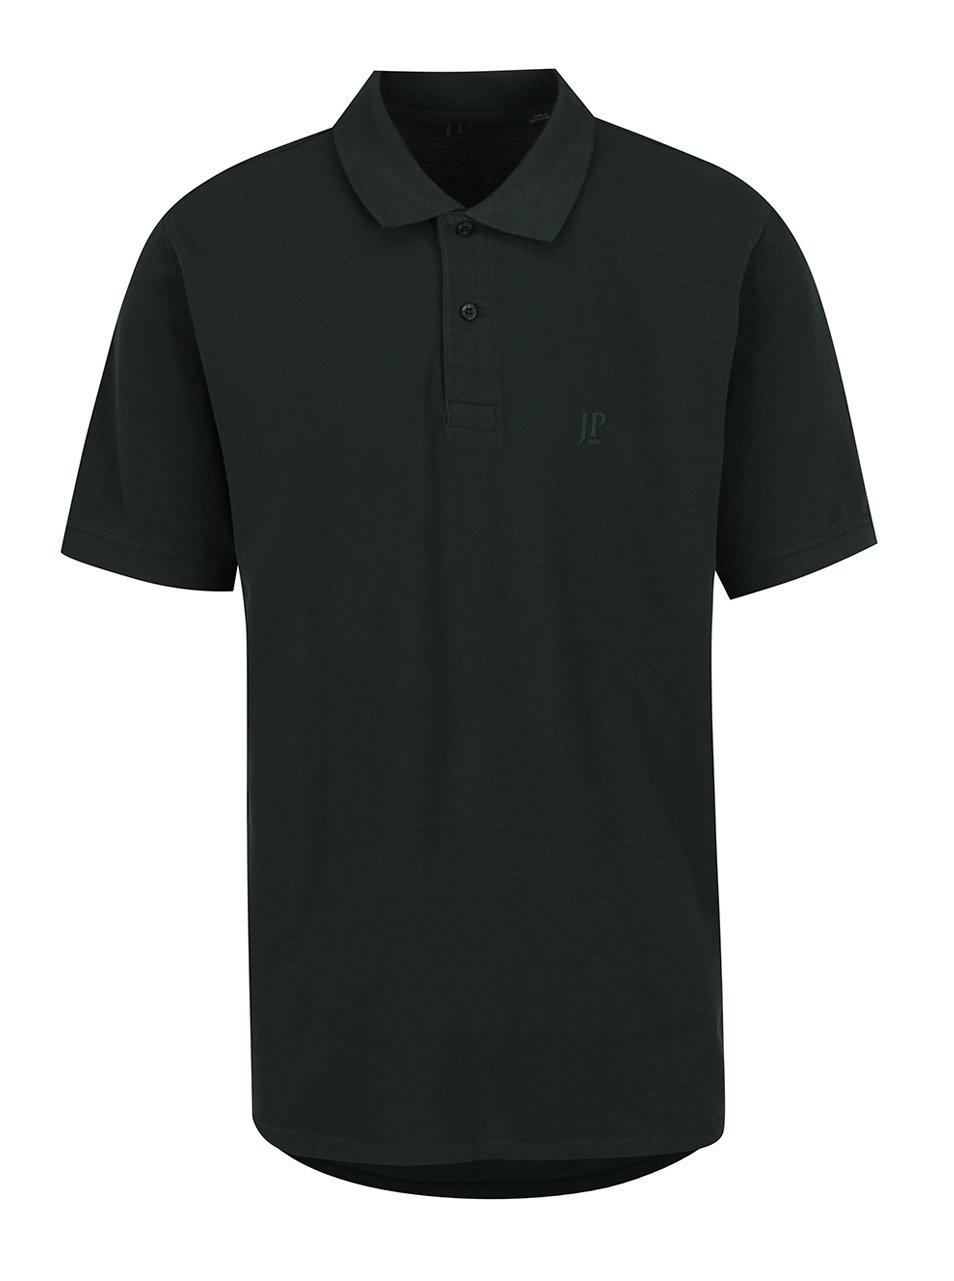 Tmavě zelené polo triko JP 1880